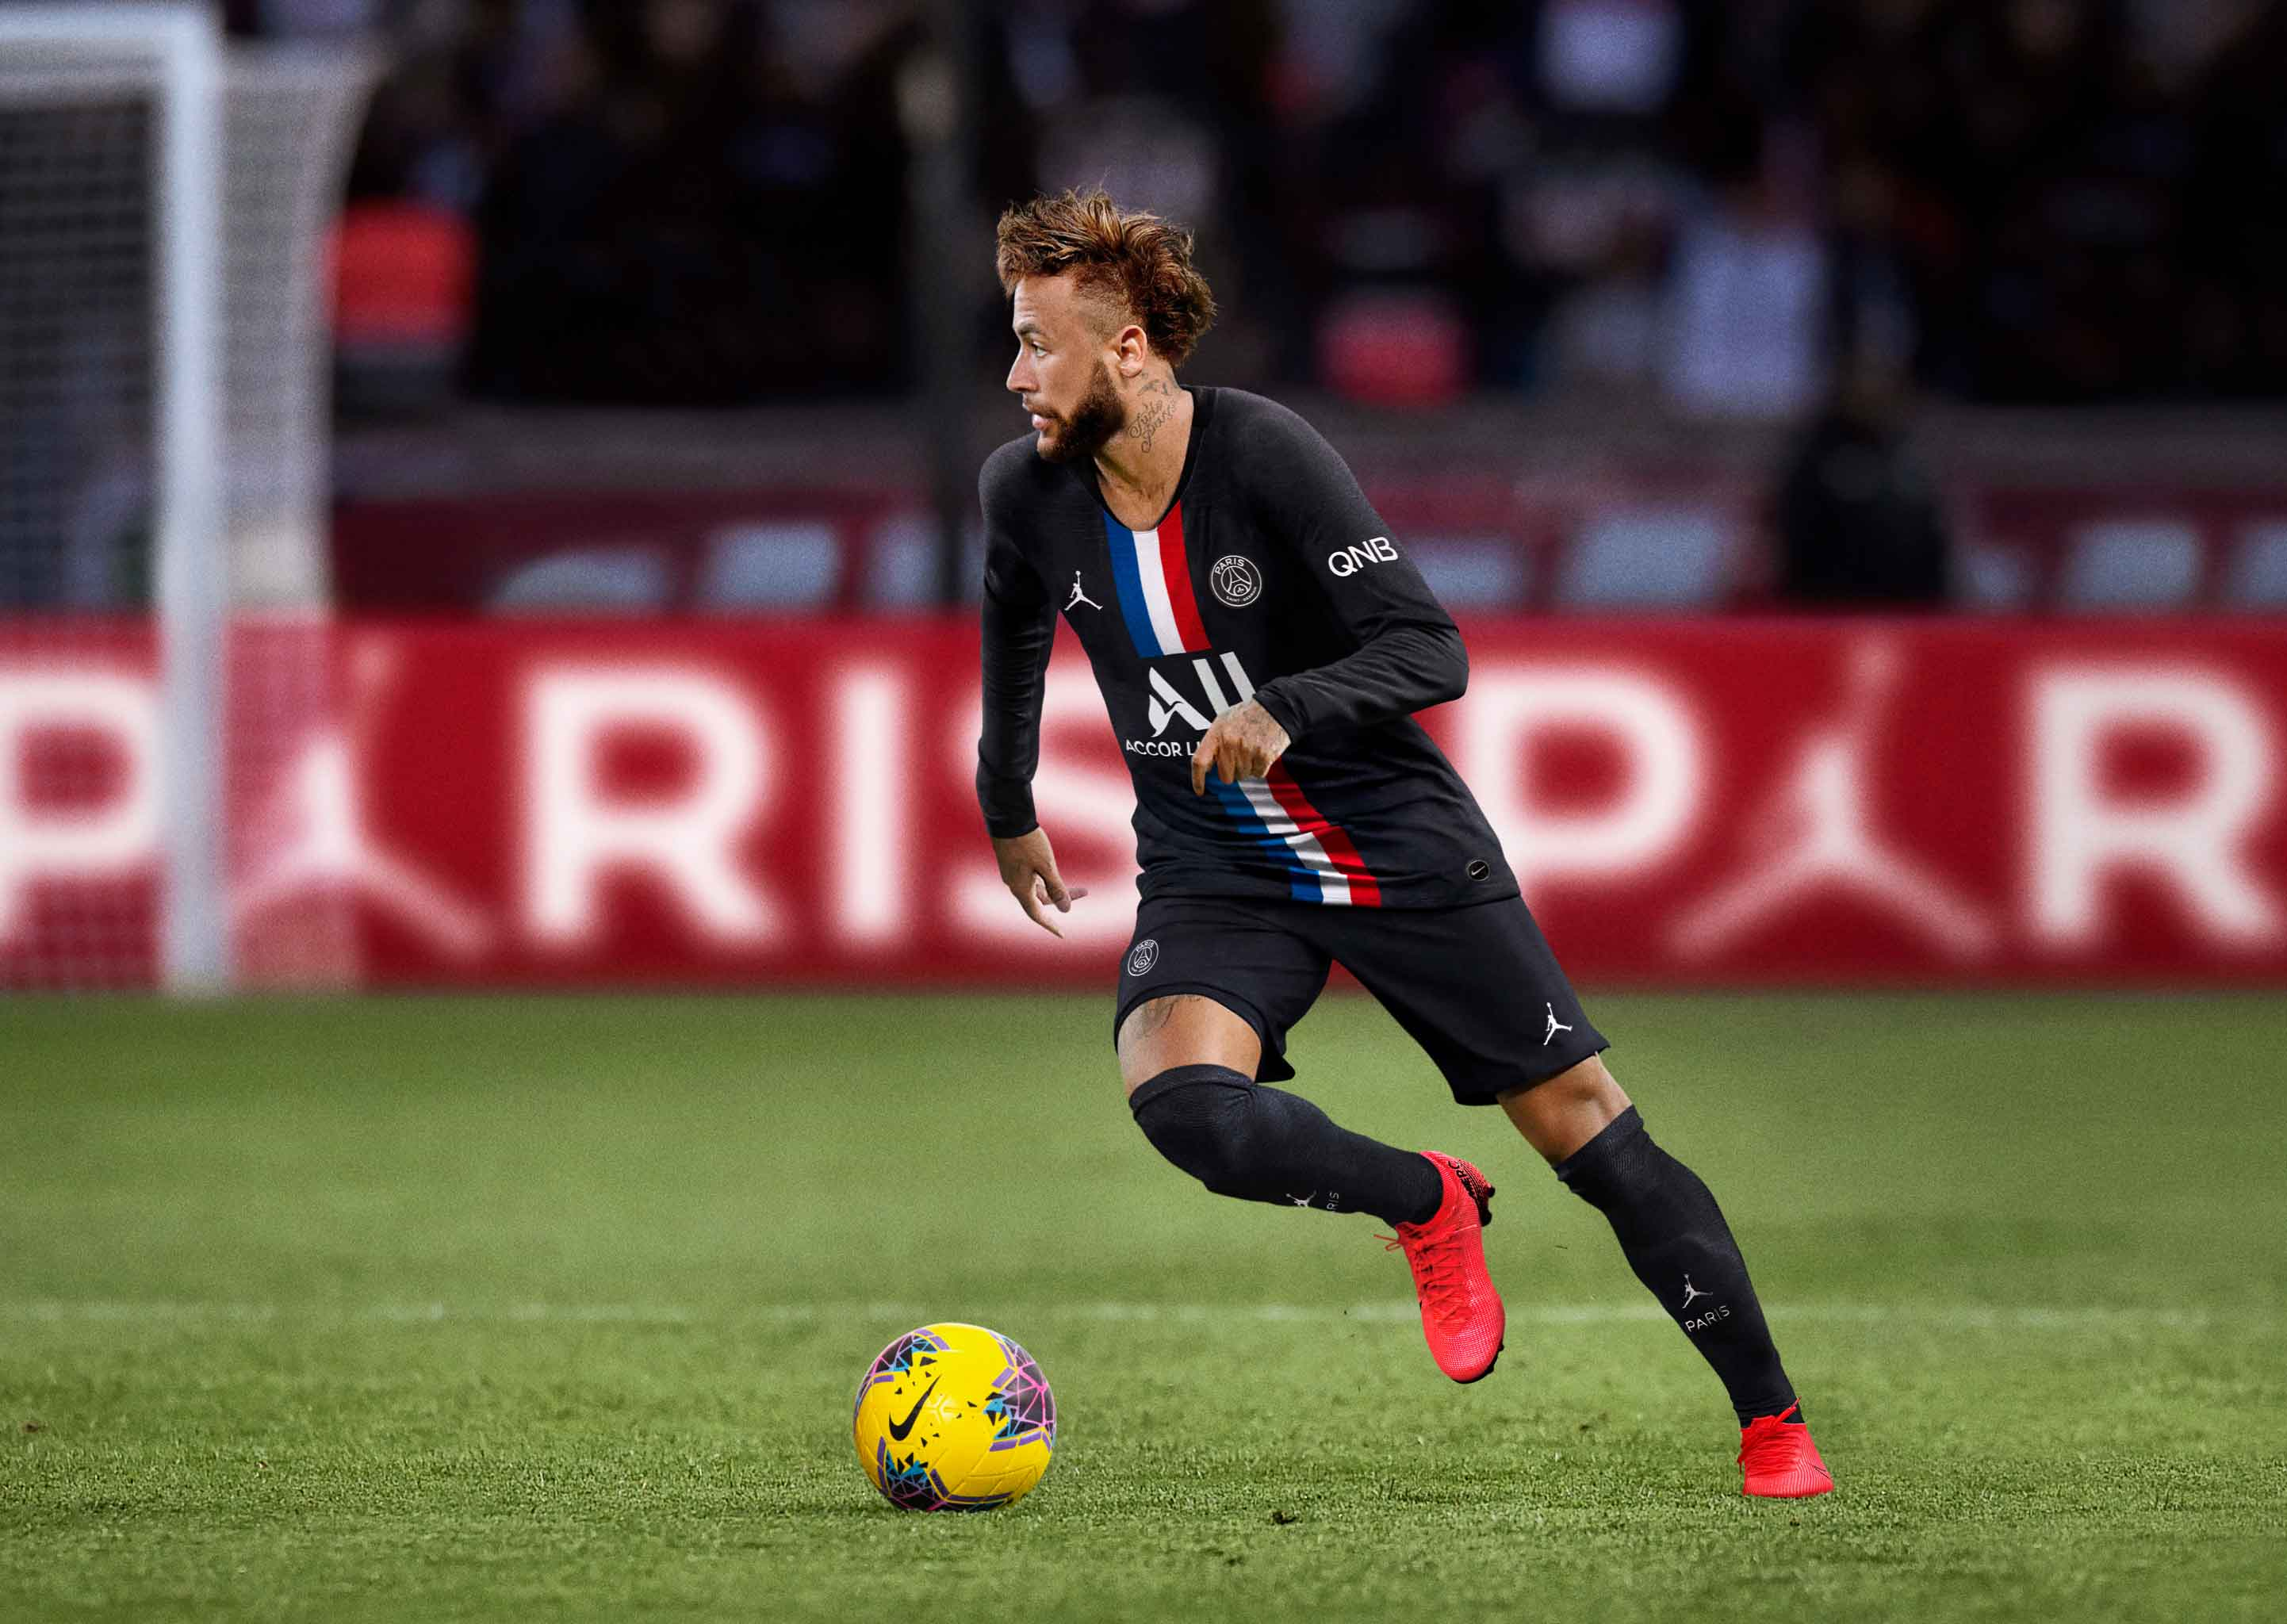 Neymar Jr con la nueva camiseta PSG y Jordan | Neymar Jr.